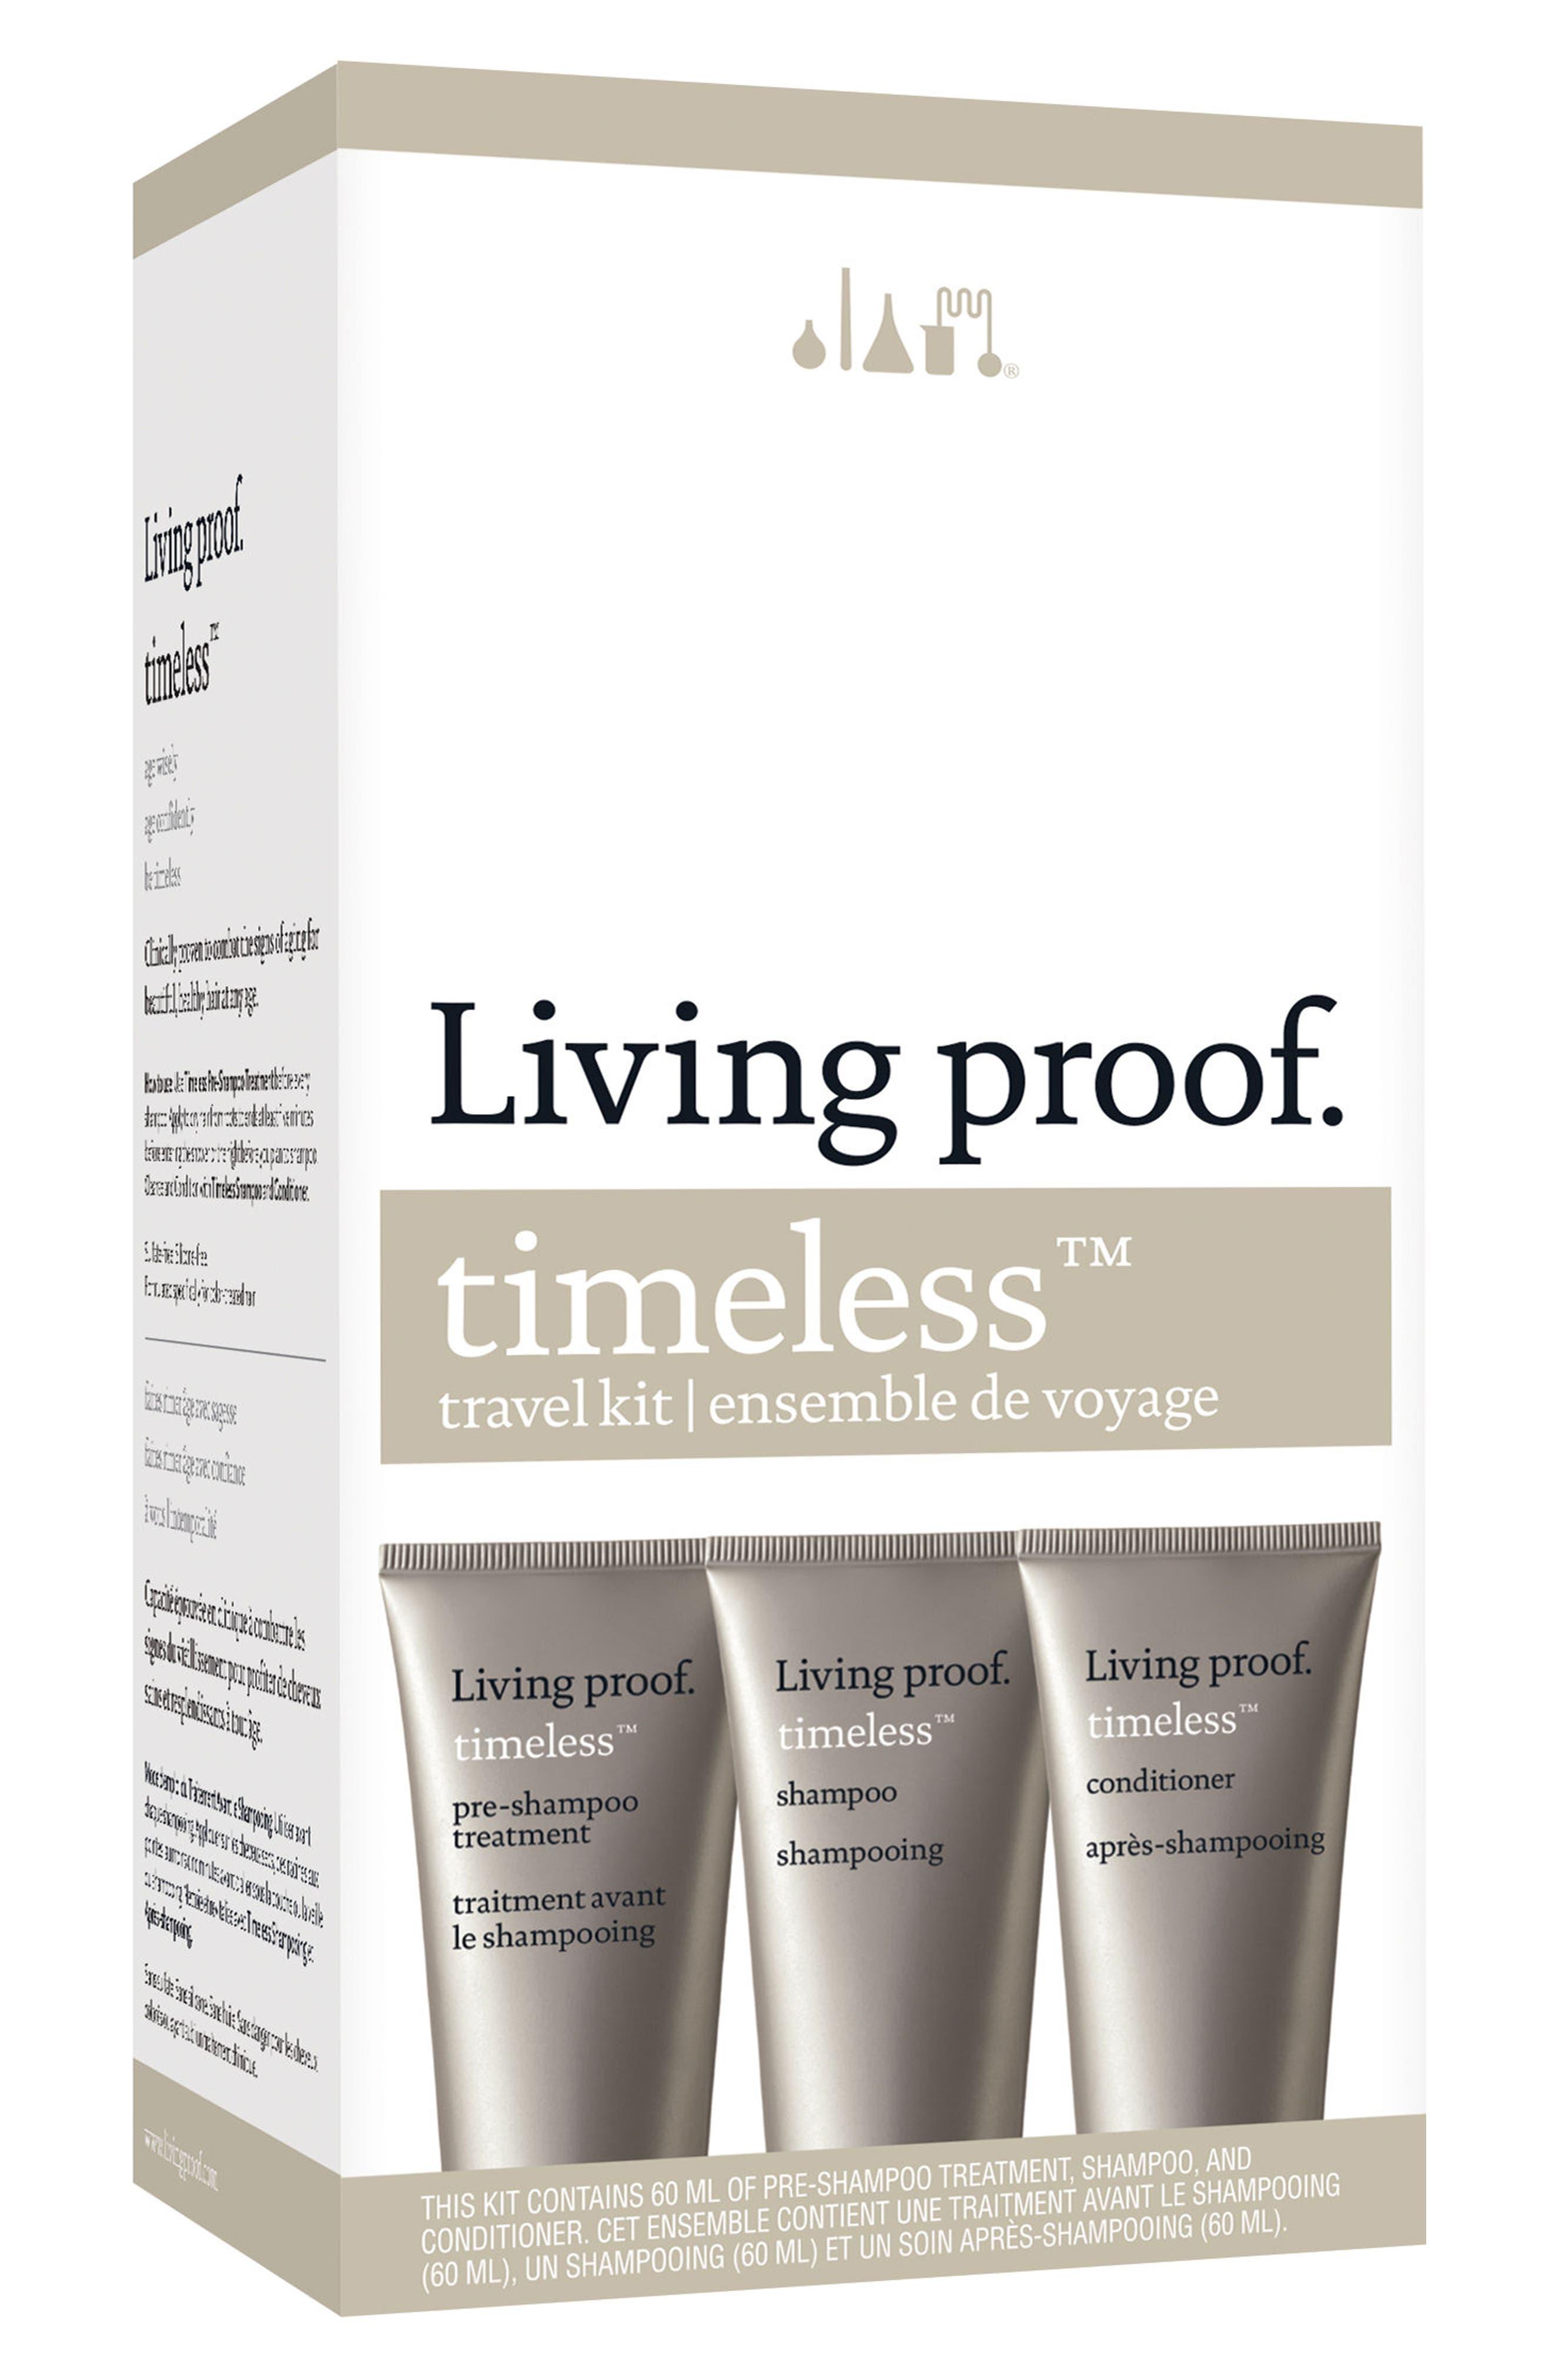 Alternate Image 1 Selected - Living proof® Timeless Travel Kit ($34 Value)